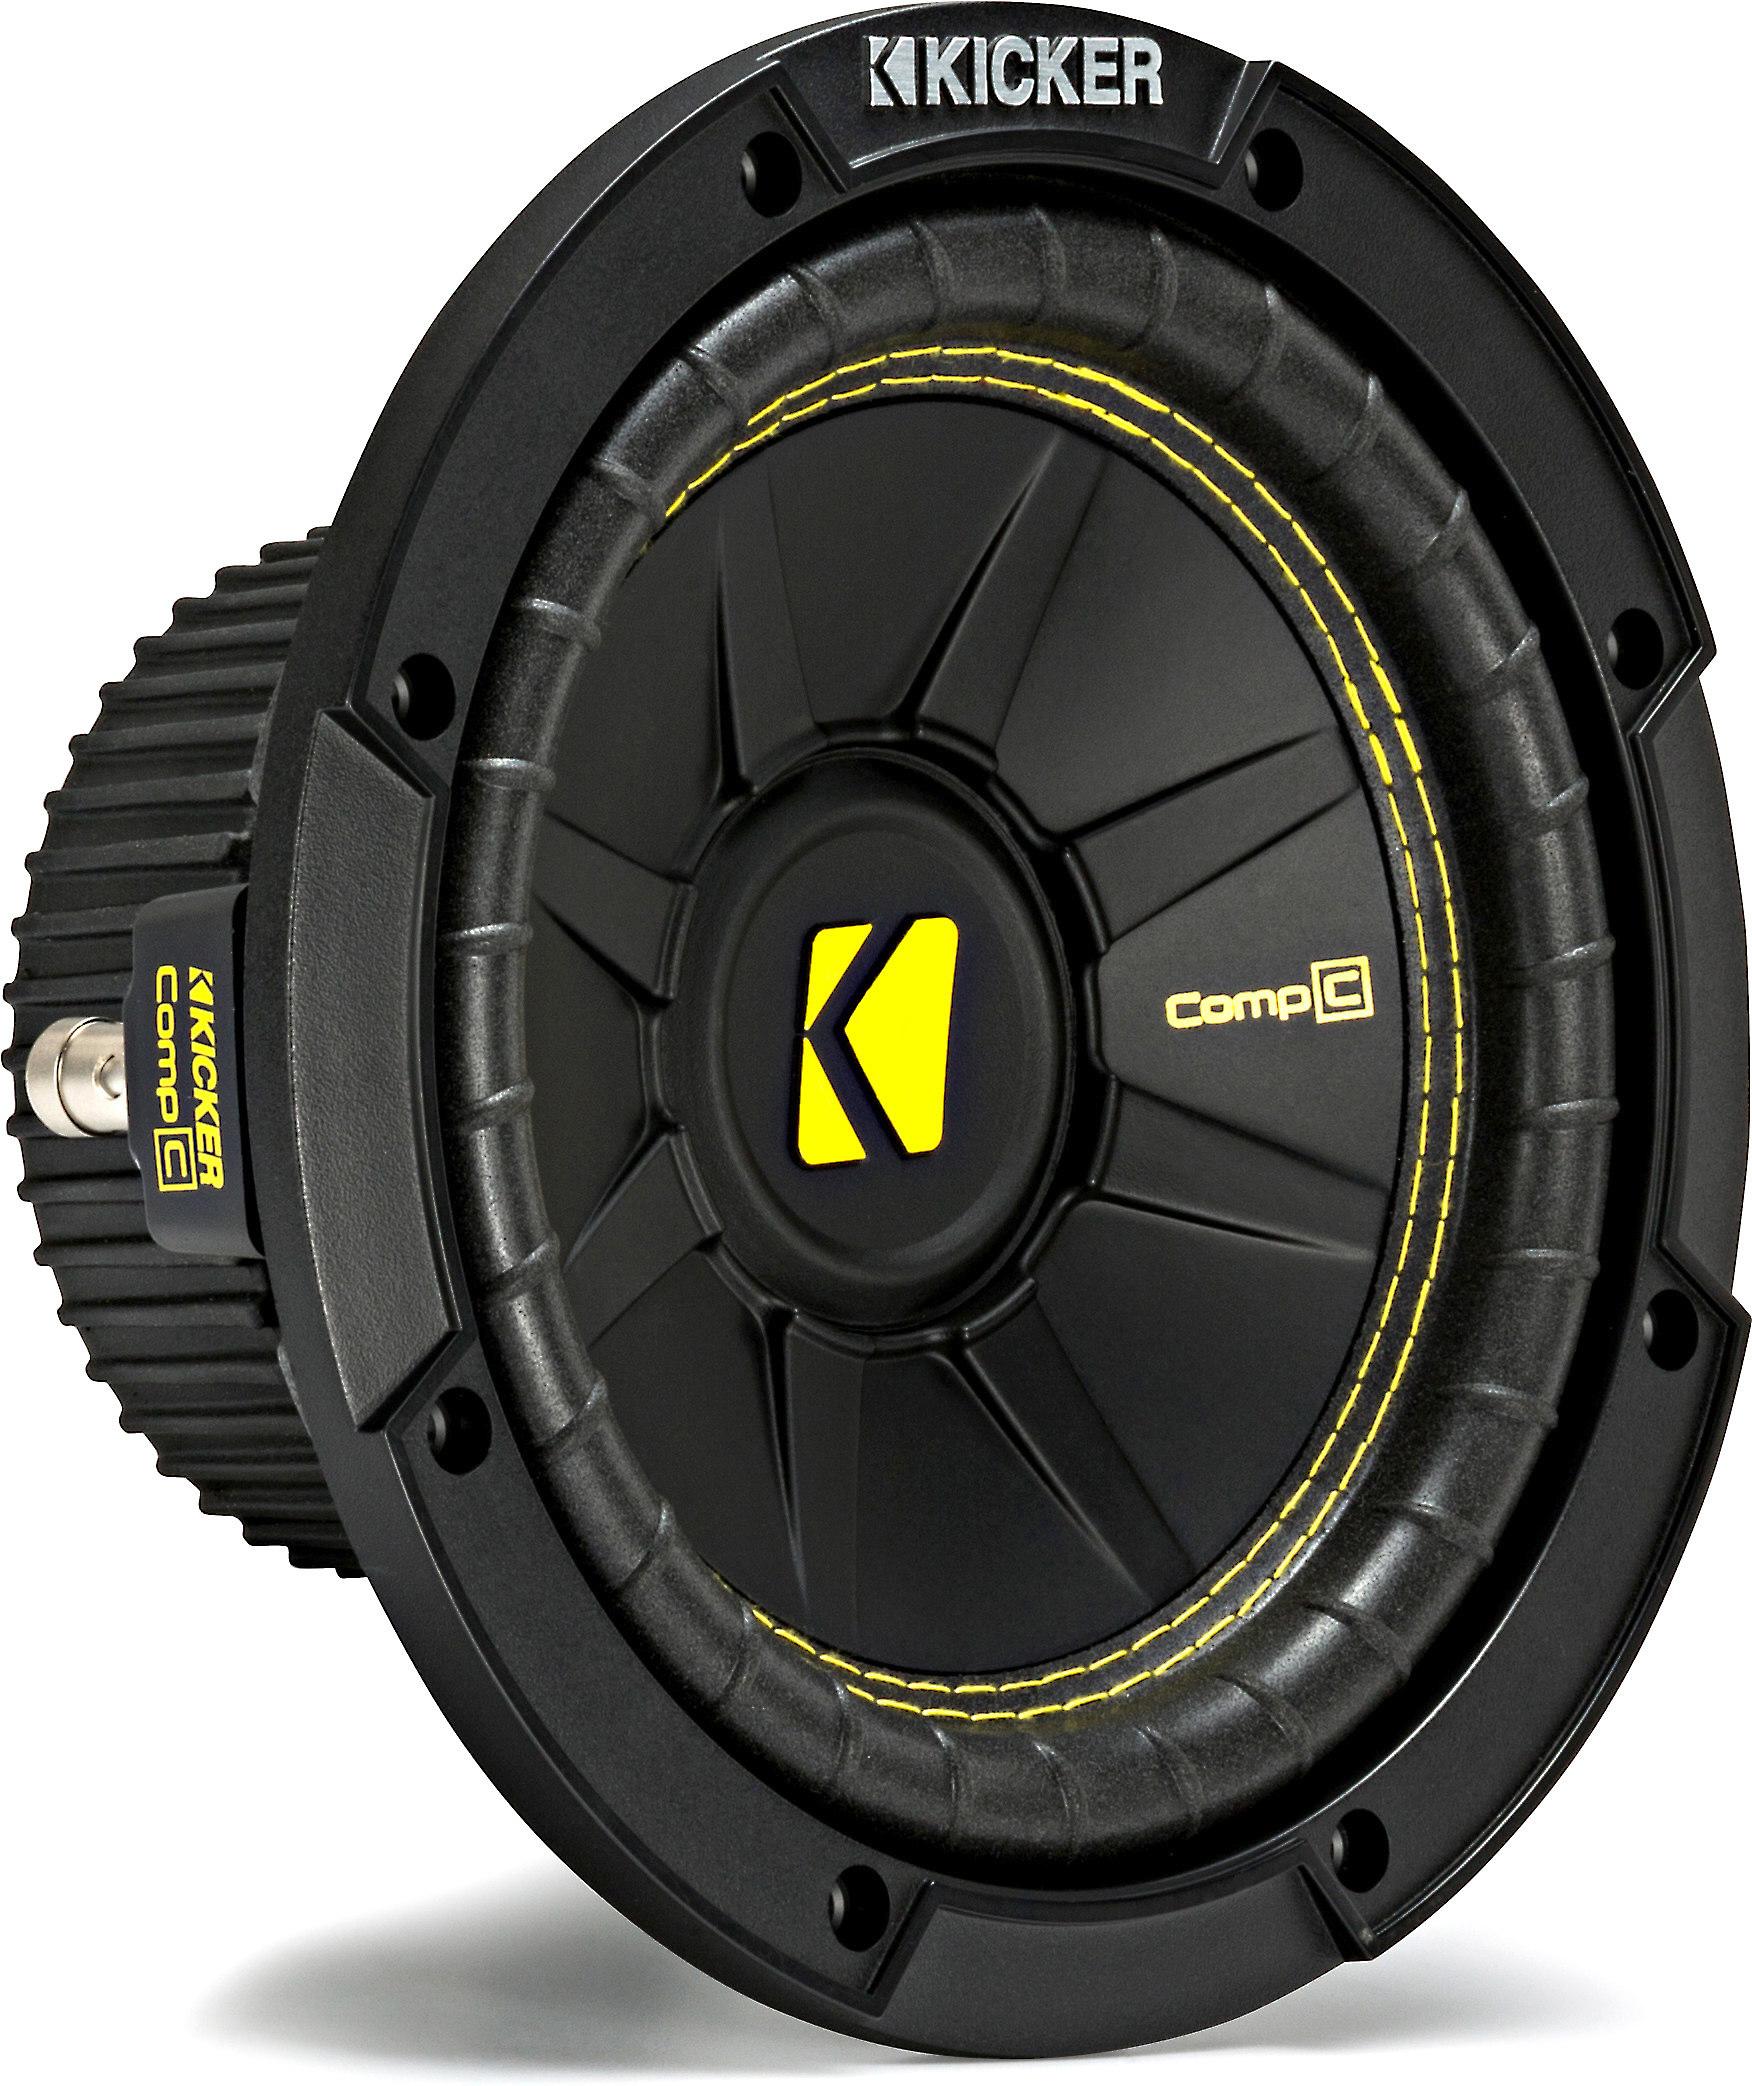 "KICKER 44CWCS84 COMP C SERIES 8/"" 4 OHM SUBWOOFER"